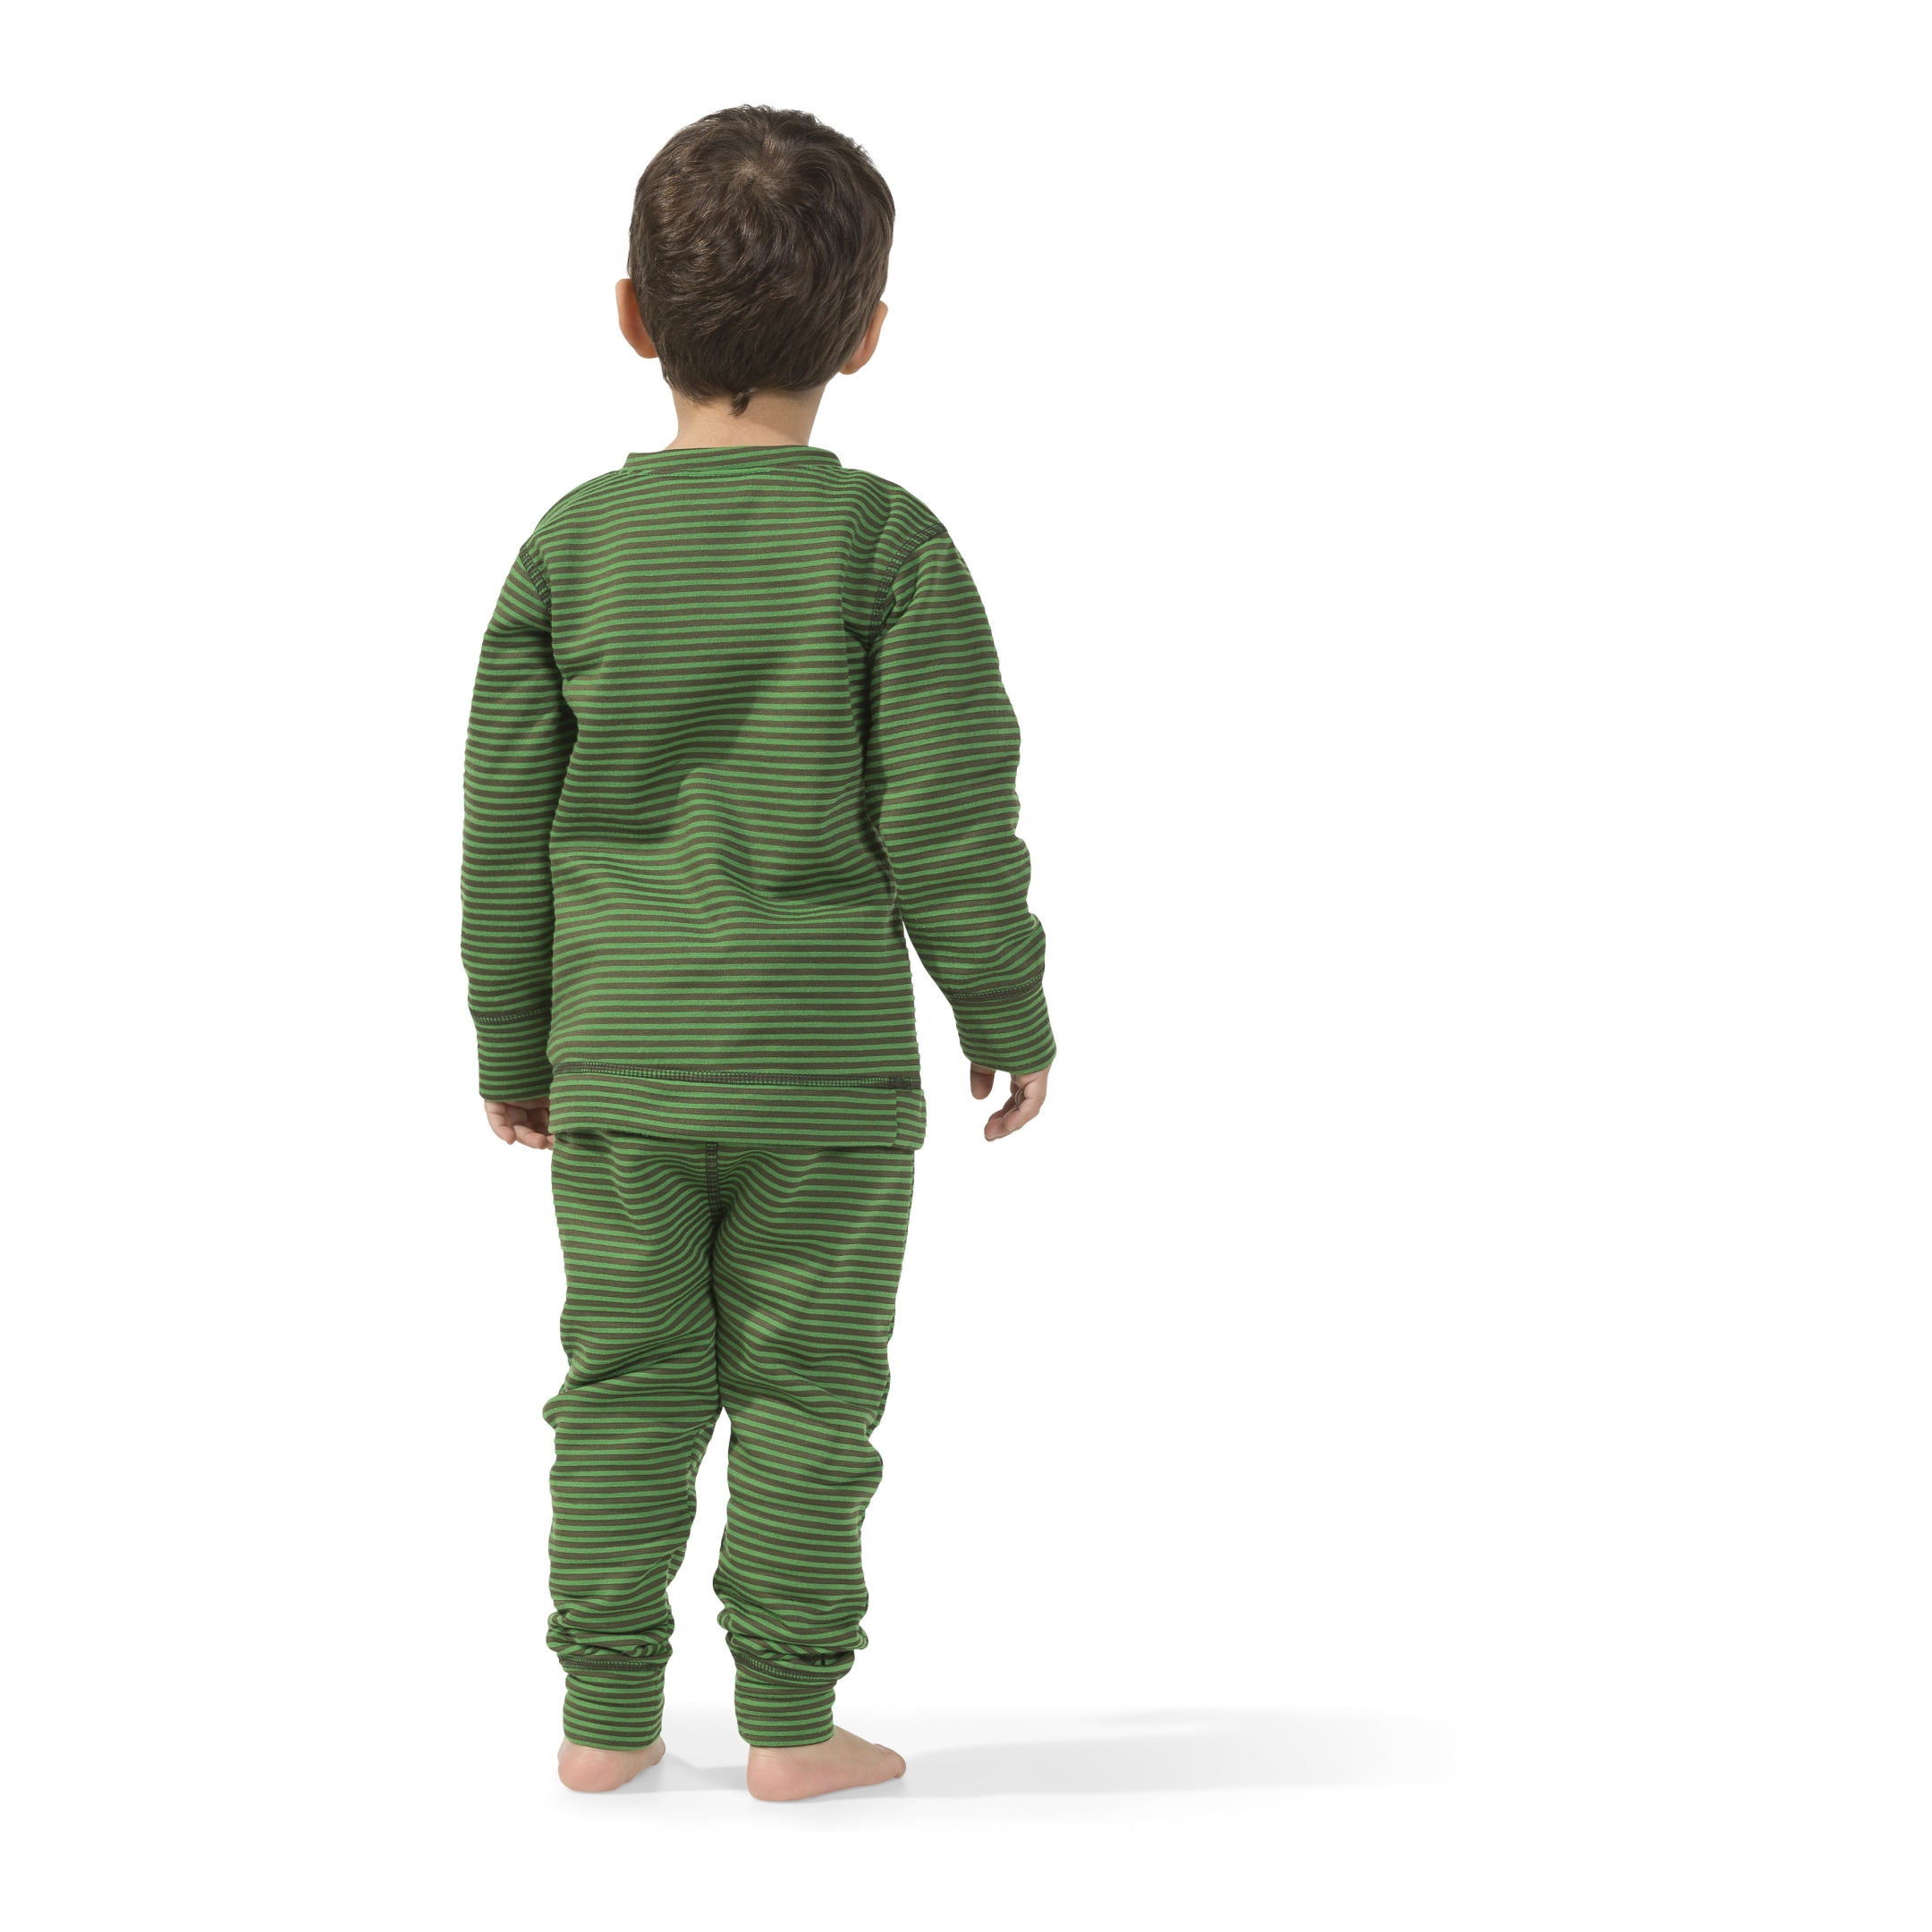 alt-detske-funkcne-pradlo-termo-pradlo-pre-deti-oblecenie-pre-chlapcov-funkcny-detsky-komplet-tricko-a-spodky-pre-deti-prva-vrstva-detske-oblecenie_didriksons_moarri_komplet-3